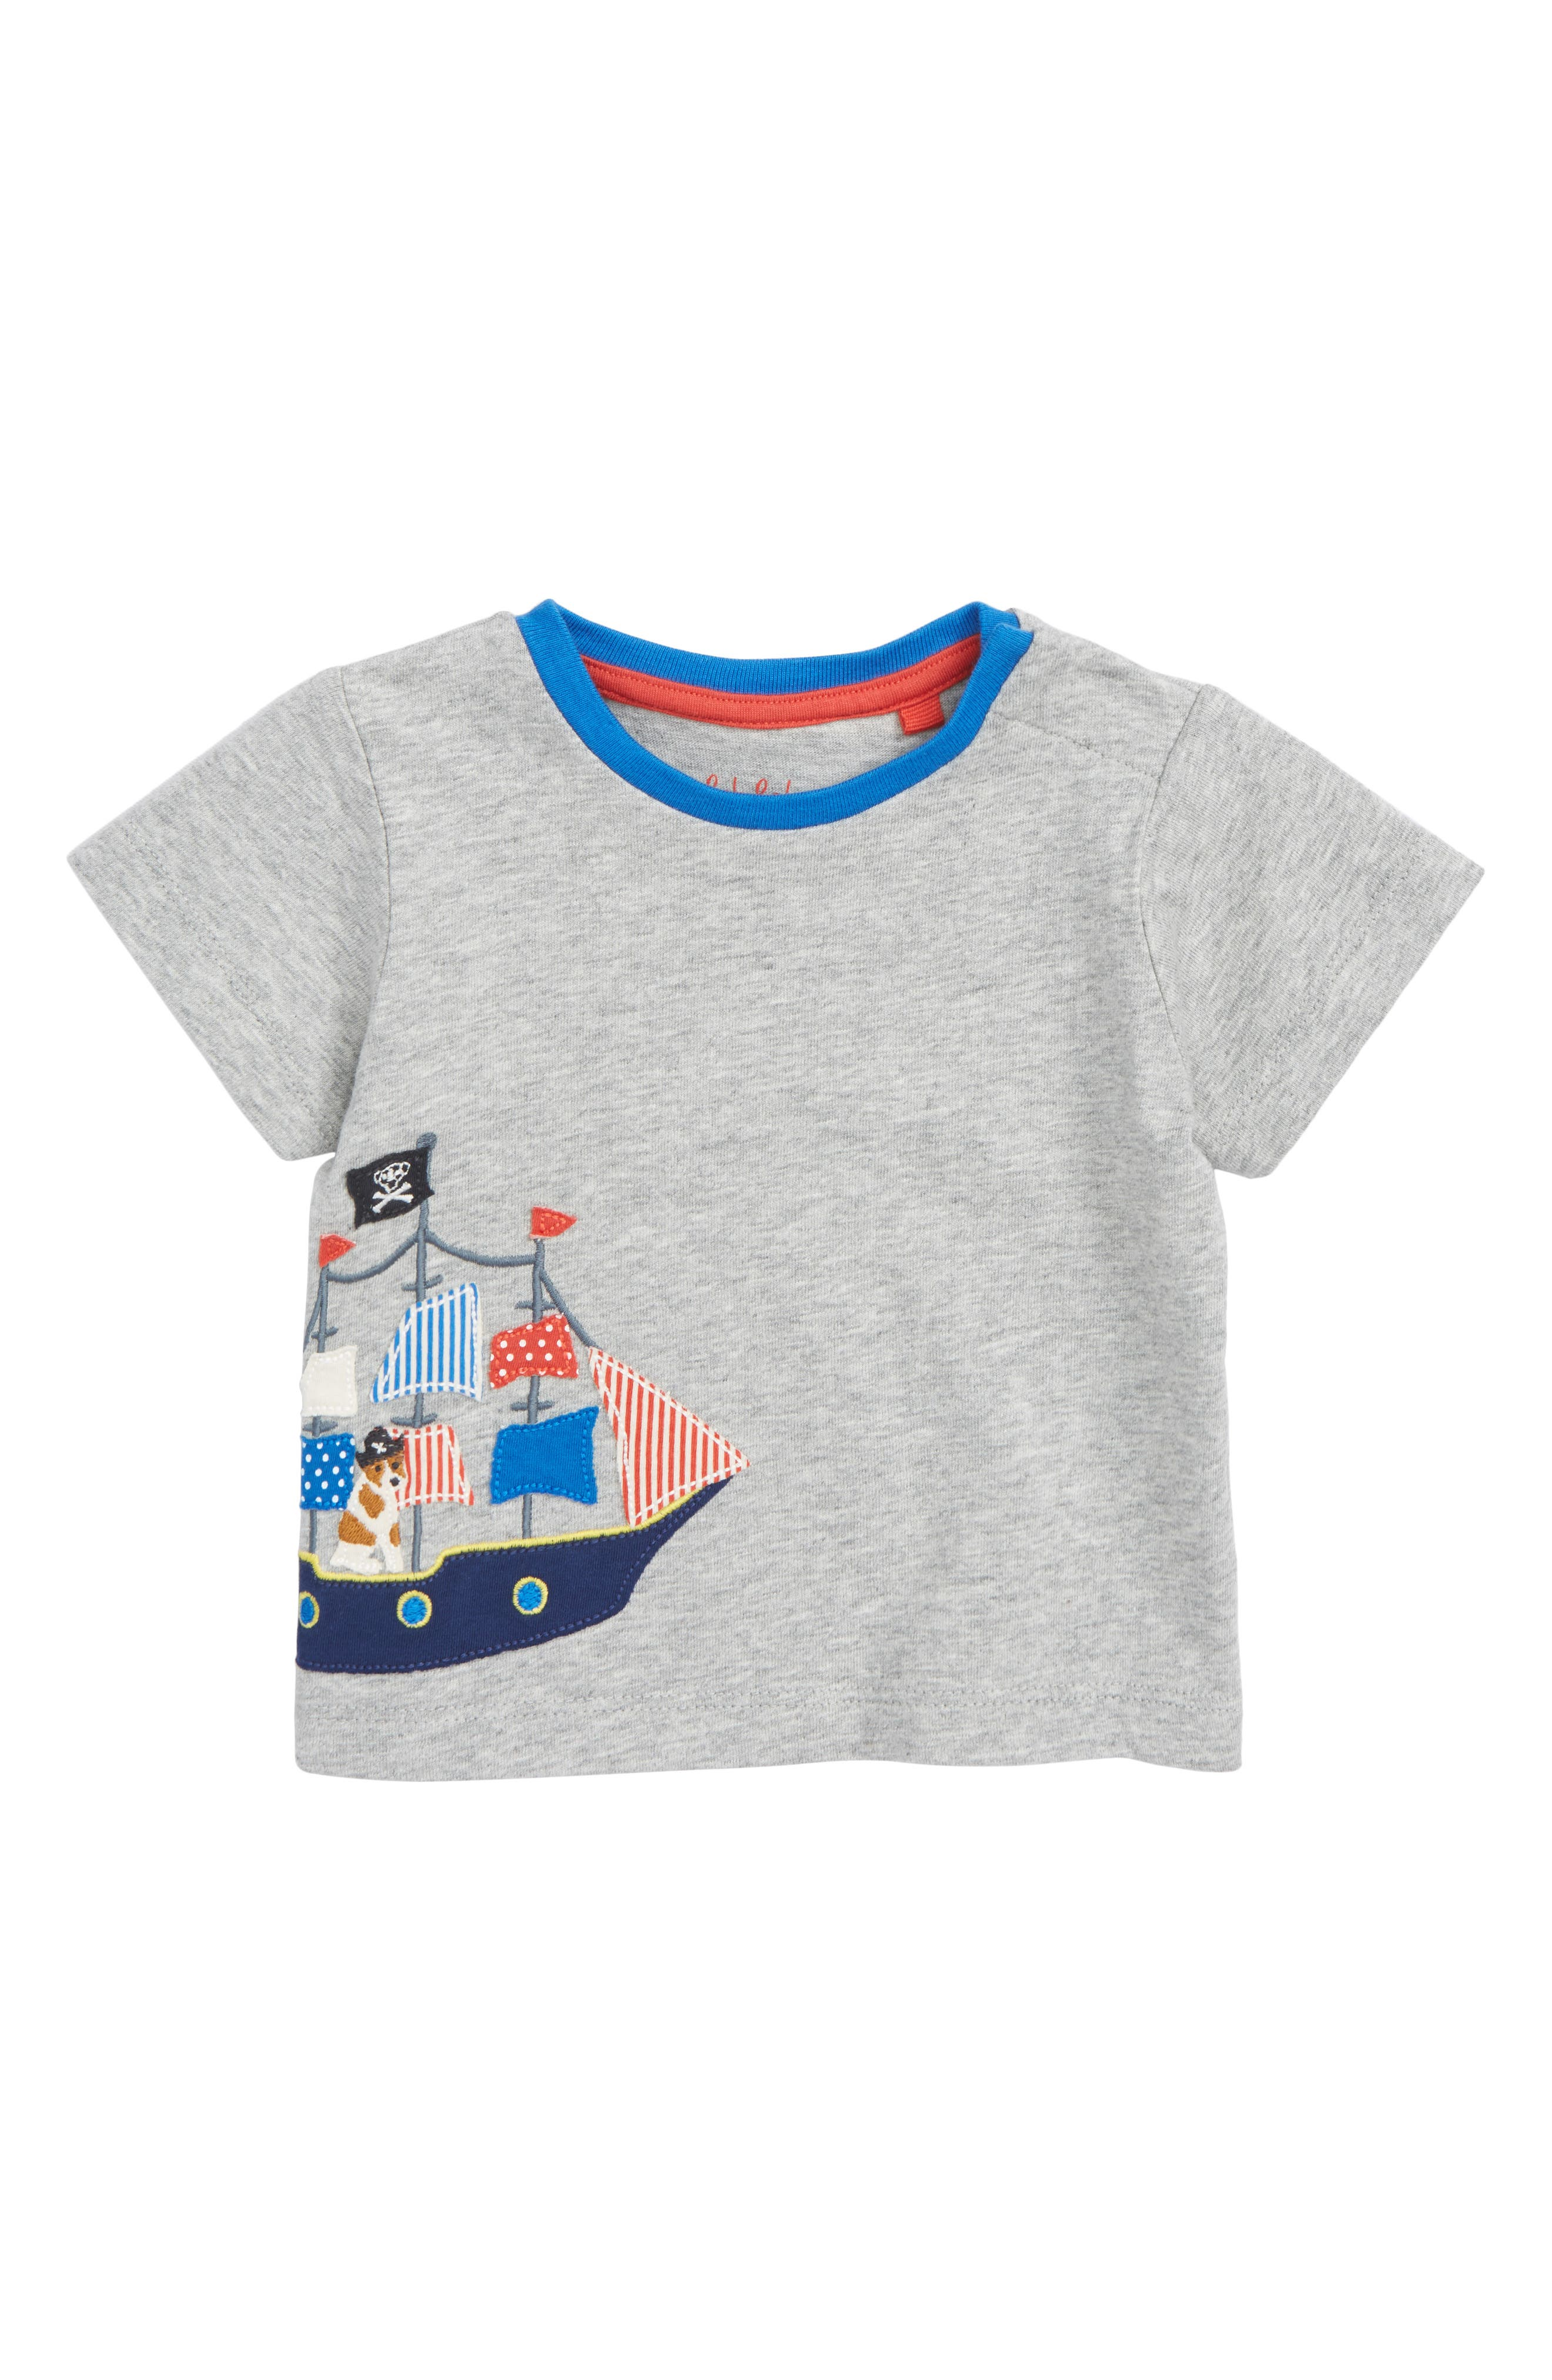 Sea Adventure Appliqué T-Shirt,                         Main,                         color, Grey Marl/ Pirate Ship